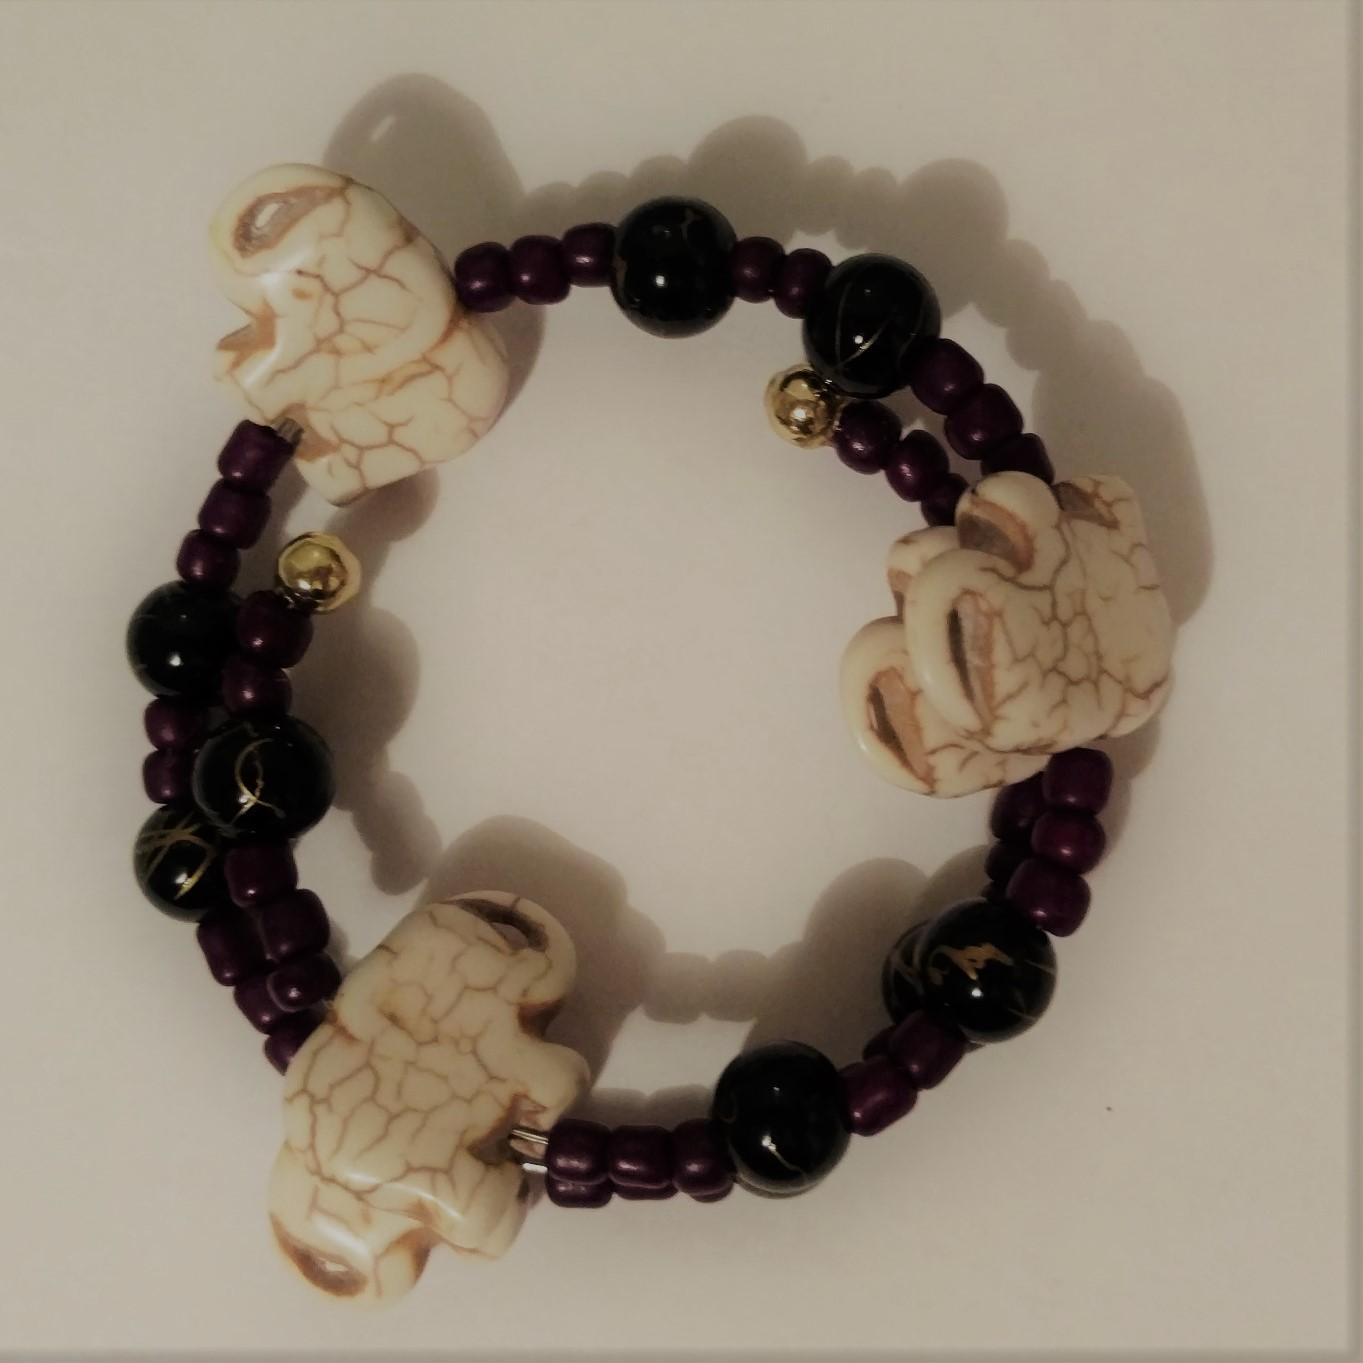 #JW-B 190020 Elephant Bracelet  Suggested $15 USD